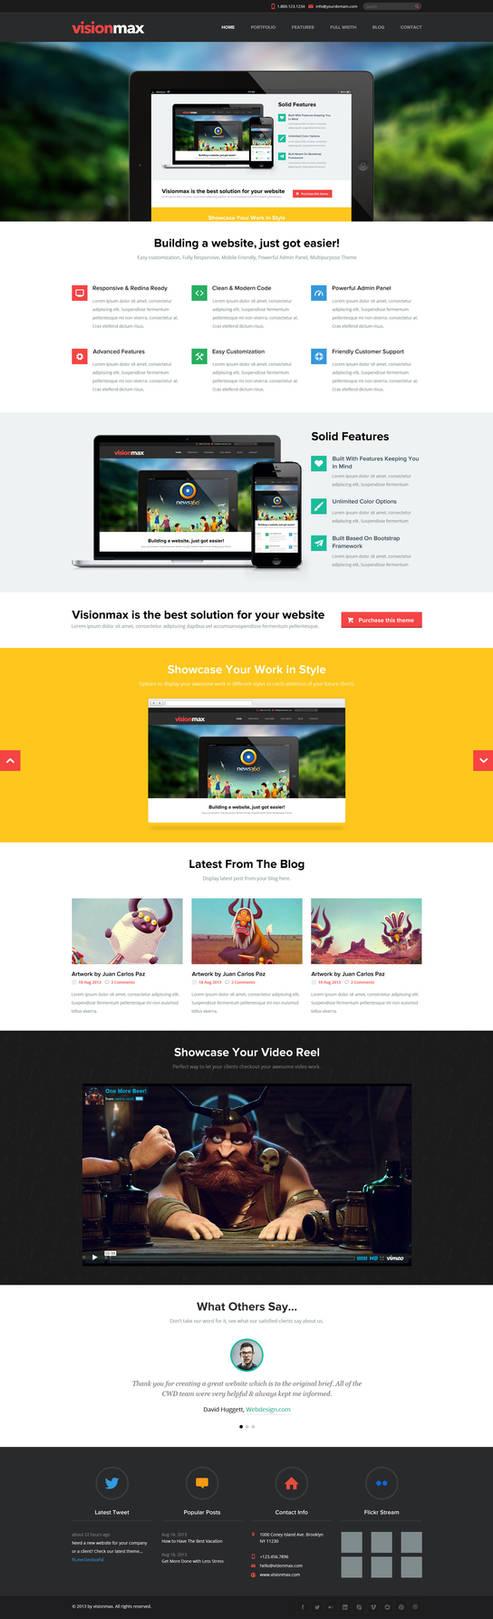 Visionmax Website